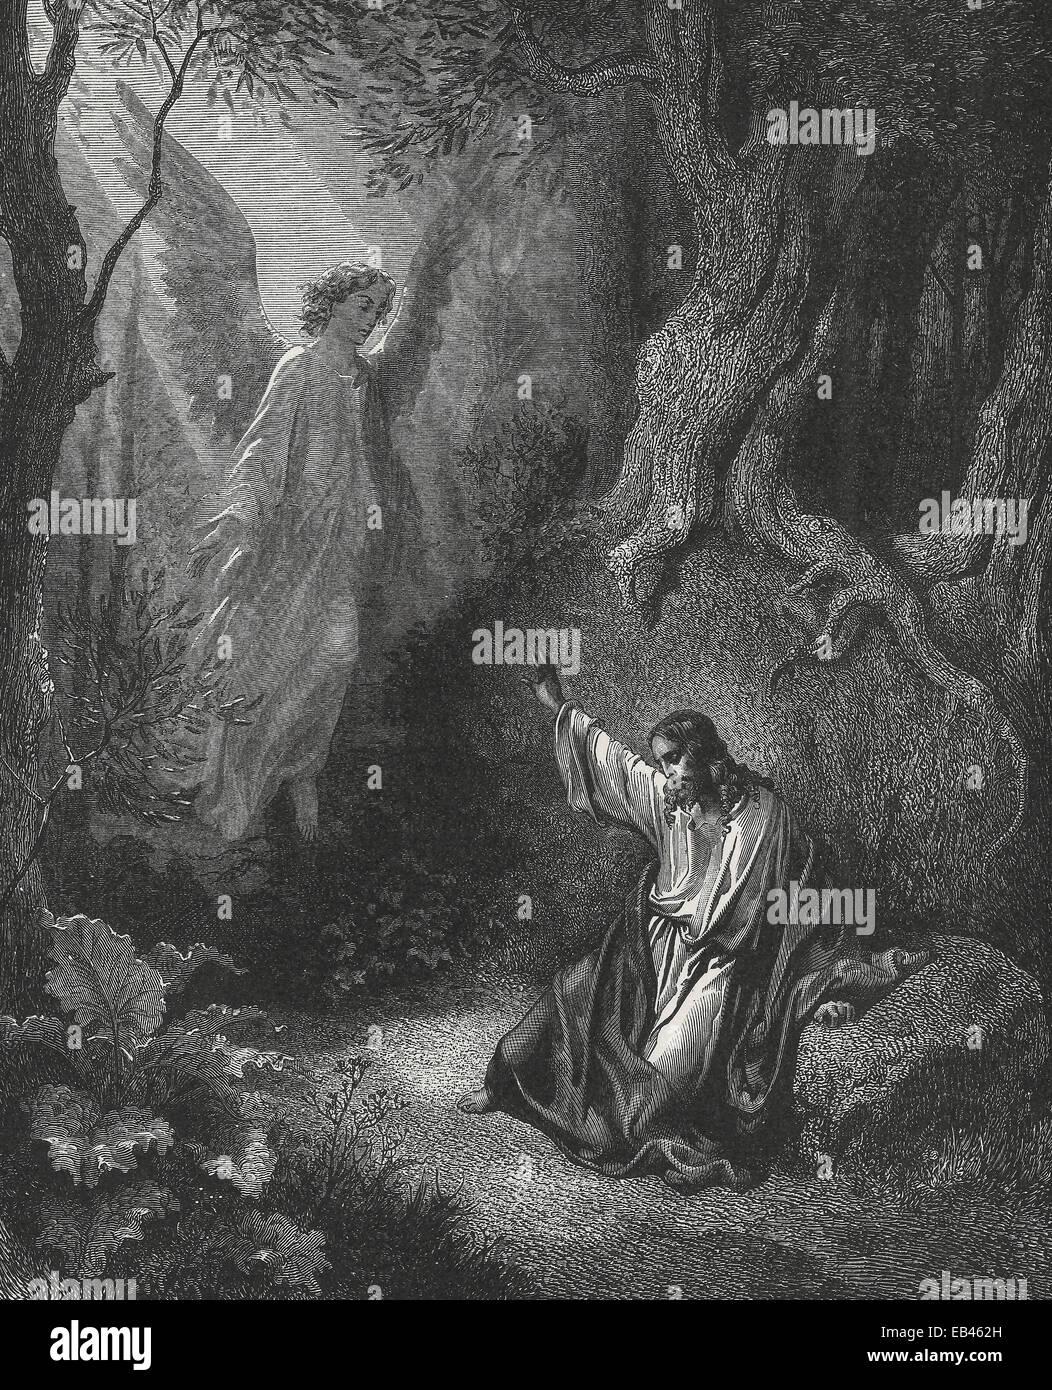 Gethsemane Jesus Stock Photos Gethsemane Jesus Stock Images Alamy